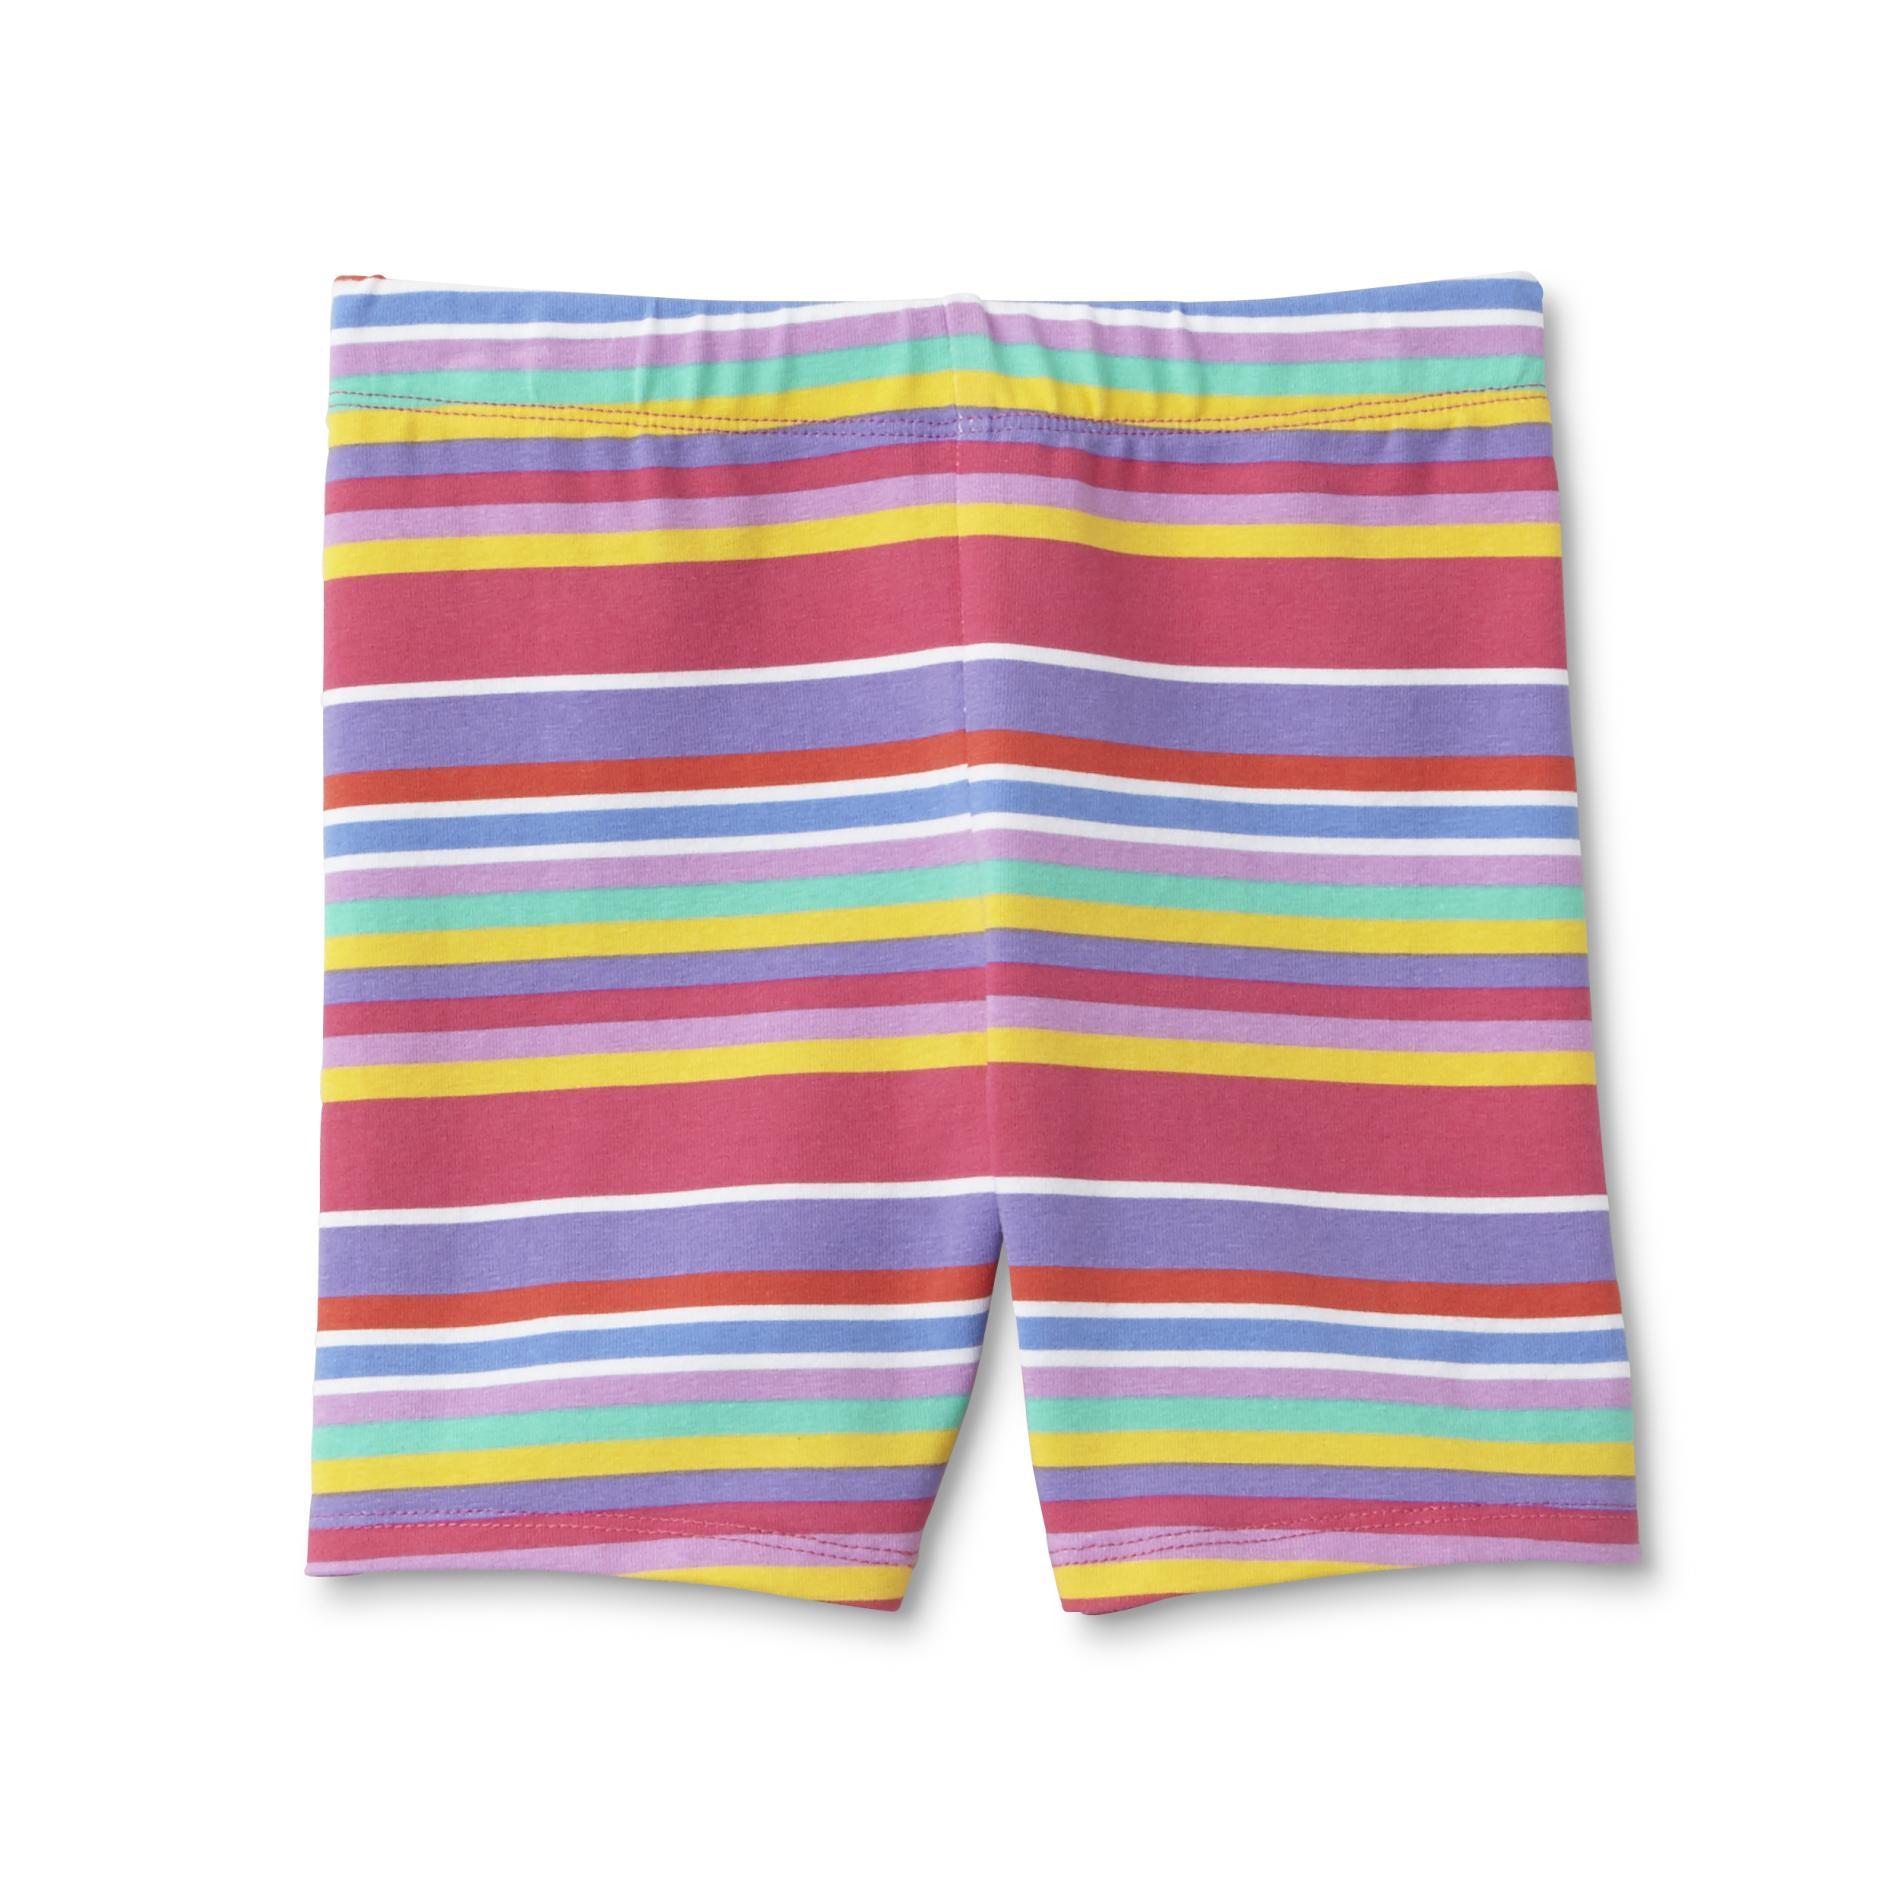 WonderKids Toddler and Infant Girls' Bike Shorts - Striped PartNumber: 024VA97227512P MfgPartNumber: GF7WK20011IT